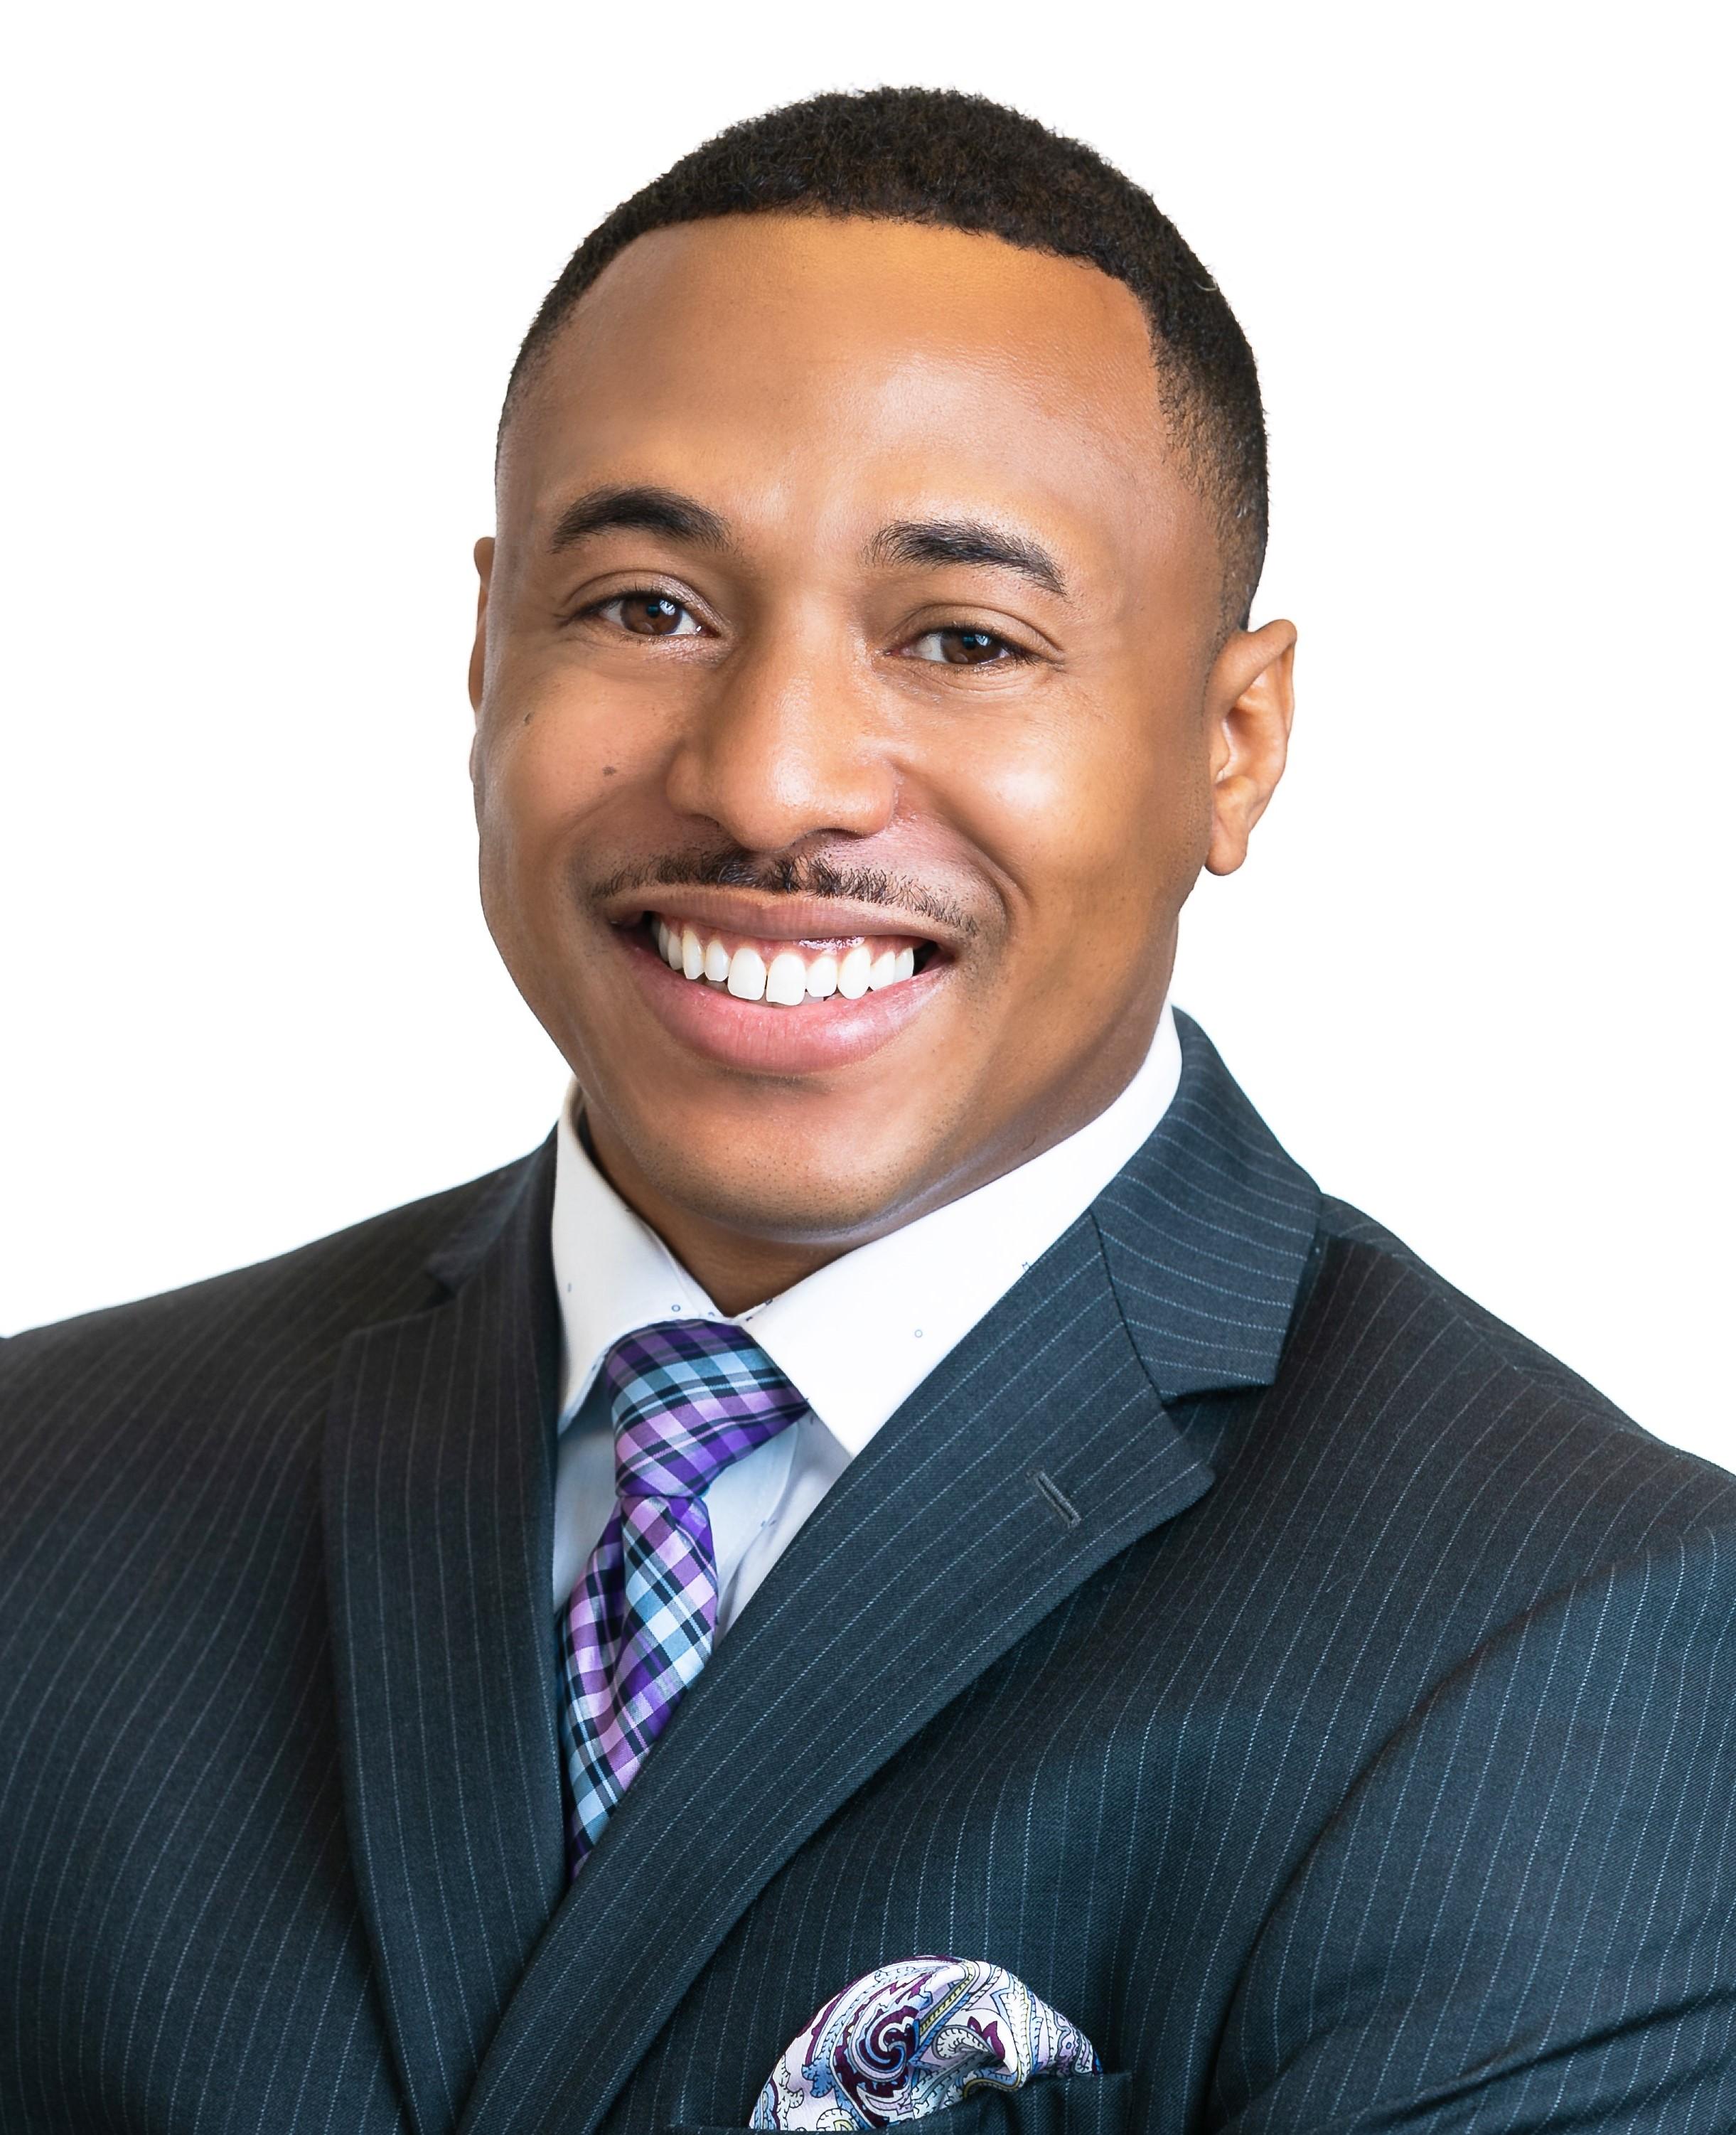 Kranston Kincaid, financial advisor Austin TX